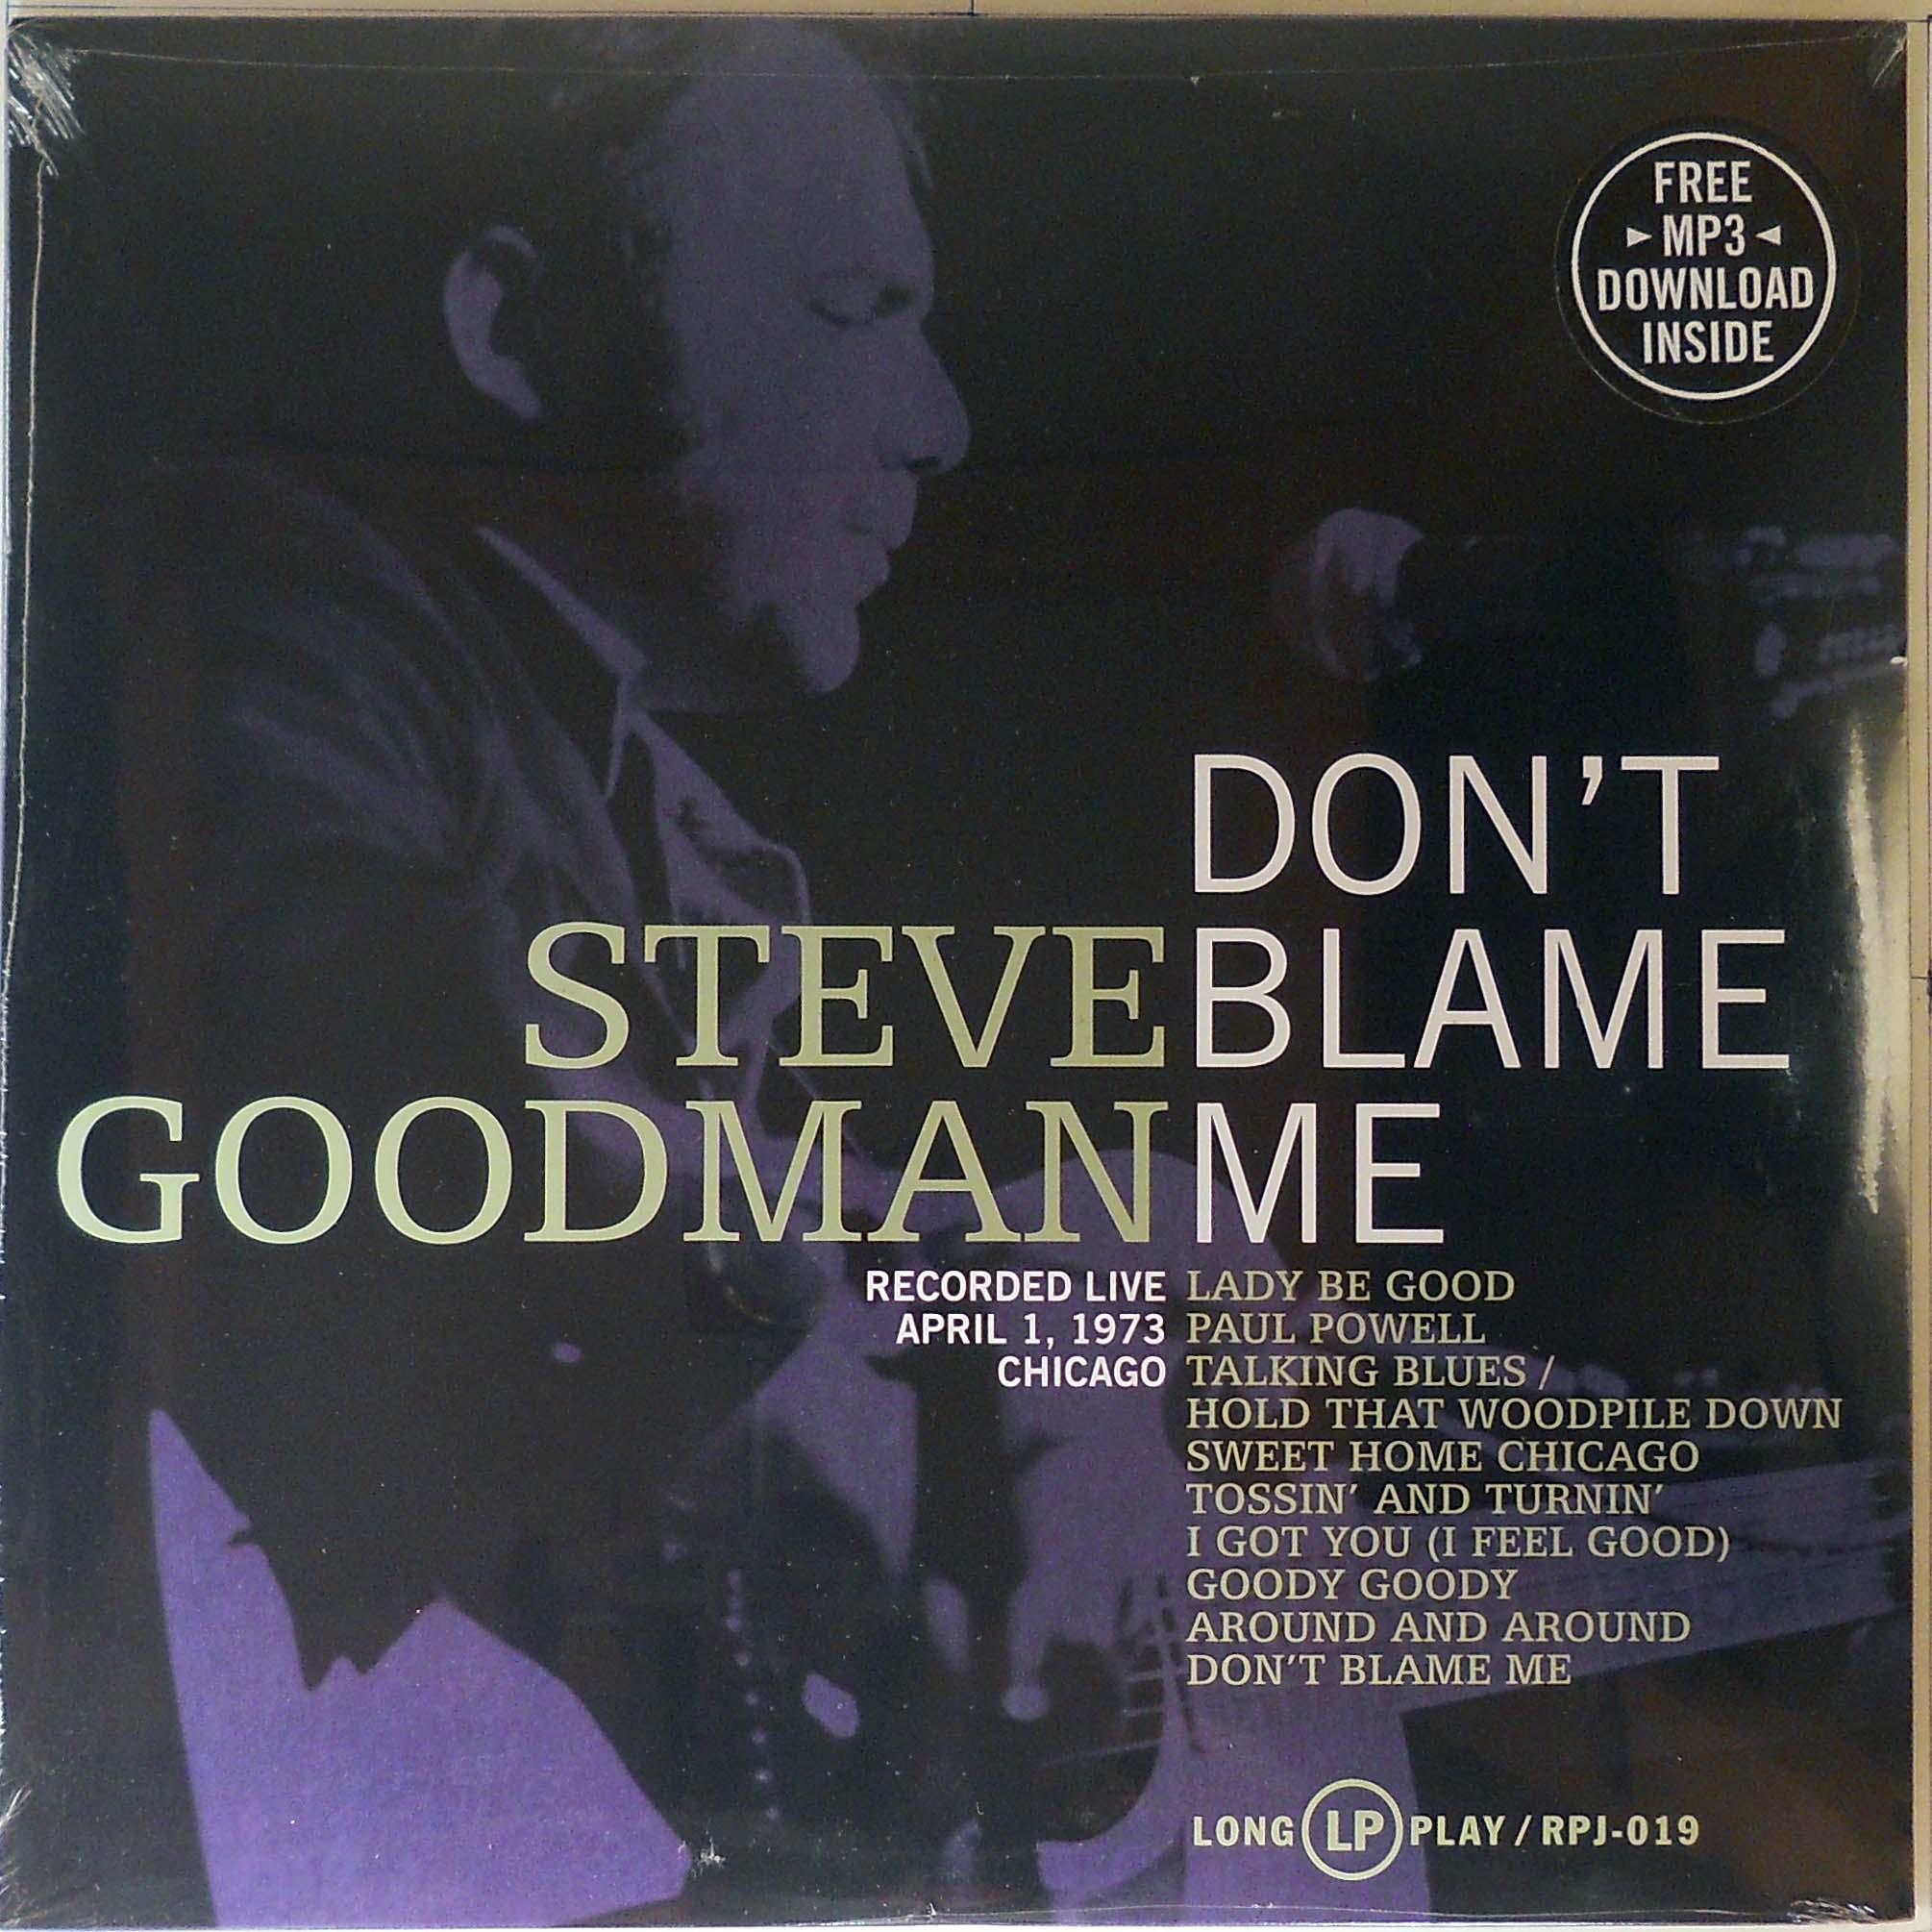 Steve Goodman - Don't Blame Me